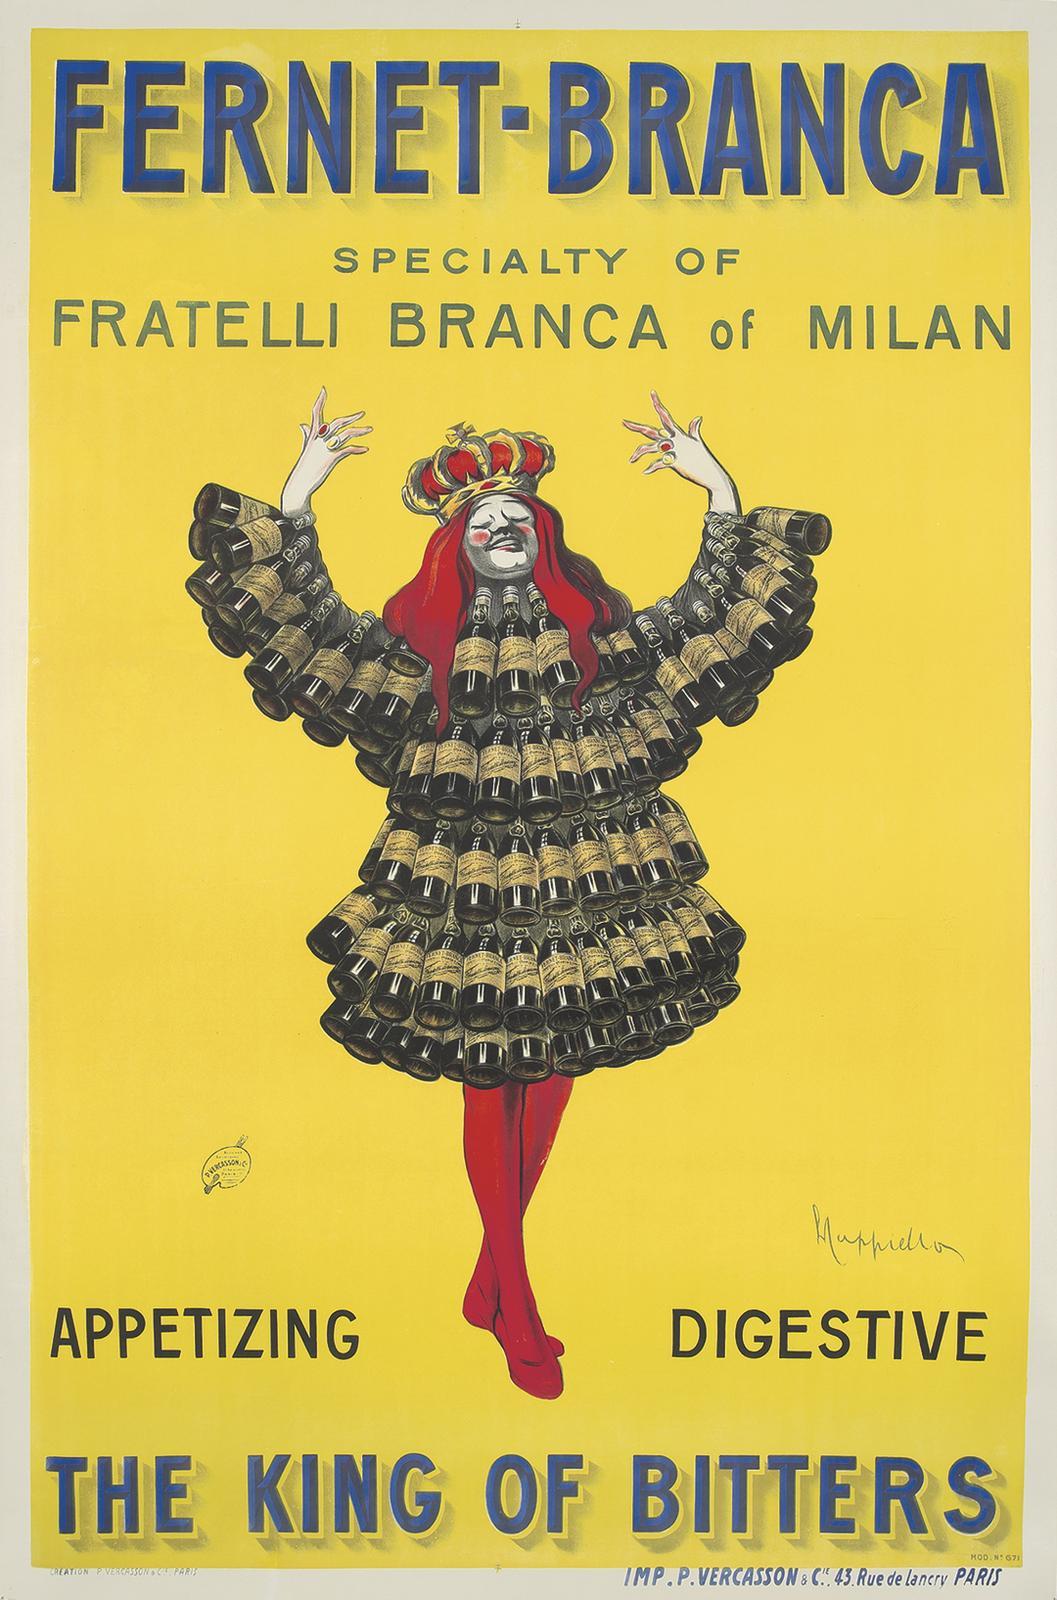 Fernet-Branca / The King of Bitters  1909  | Rennert's Gallery